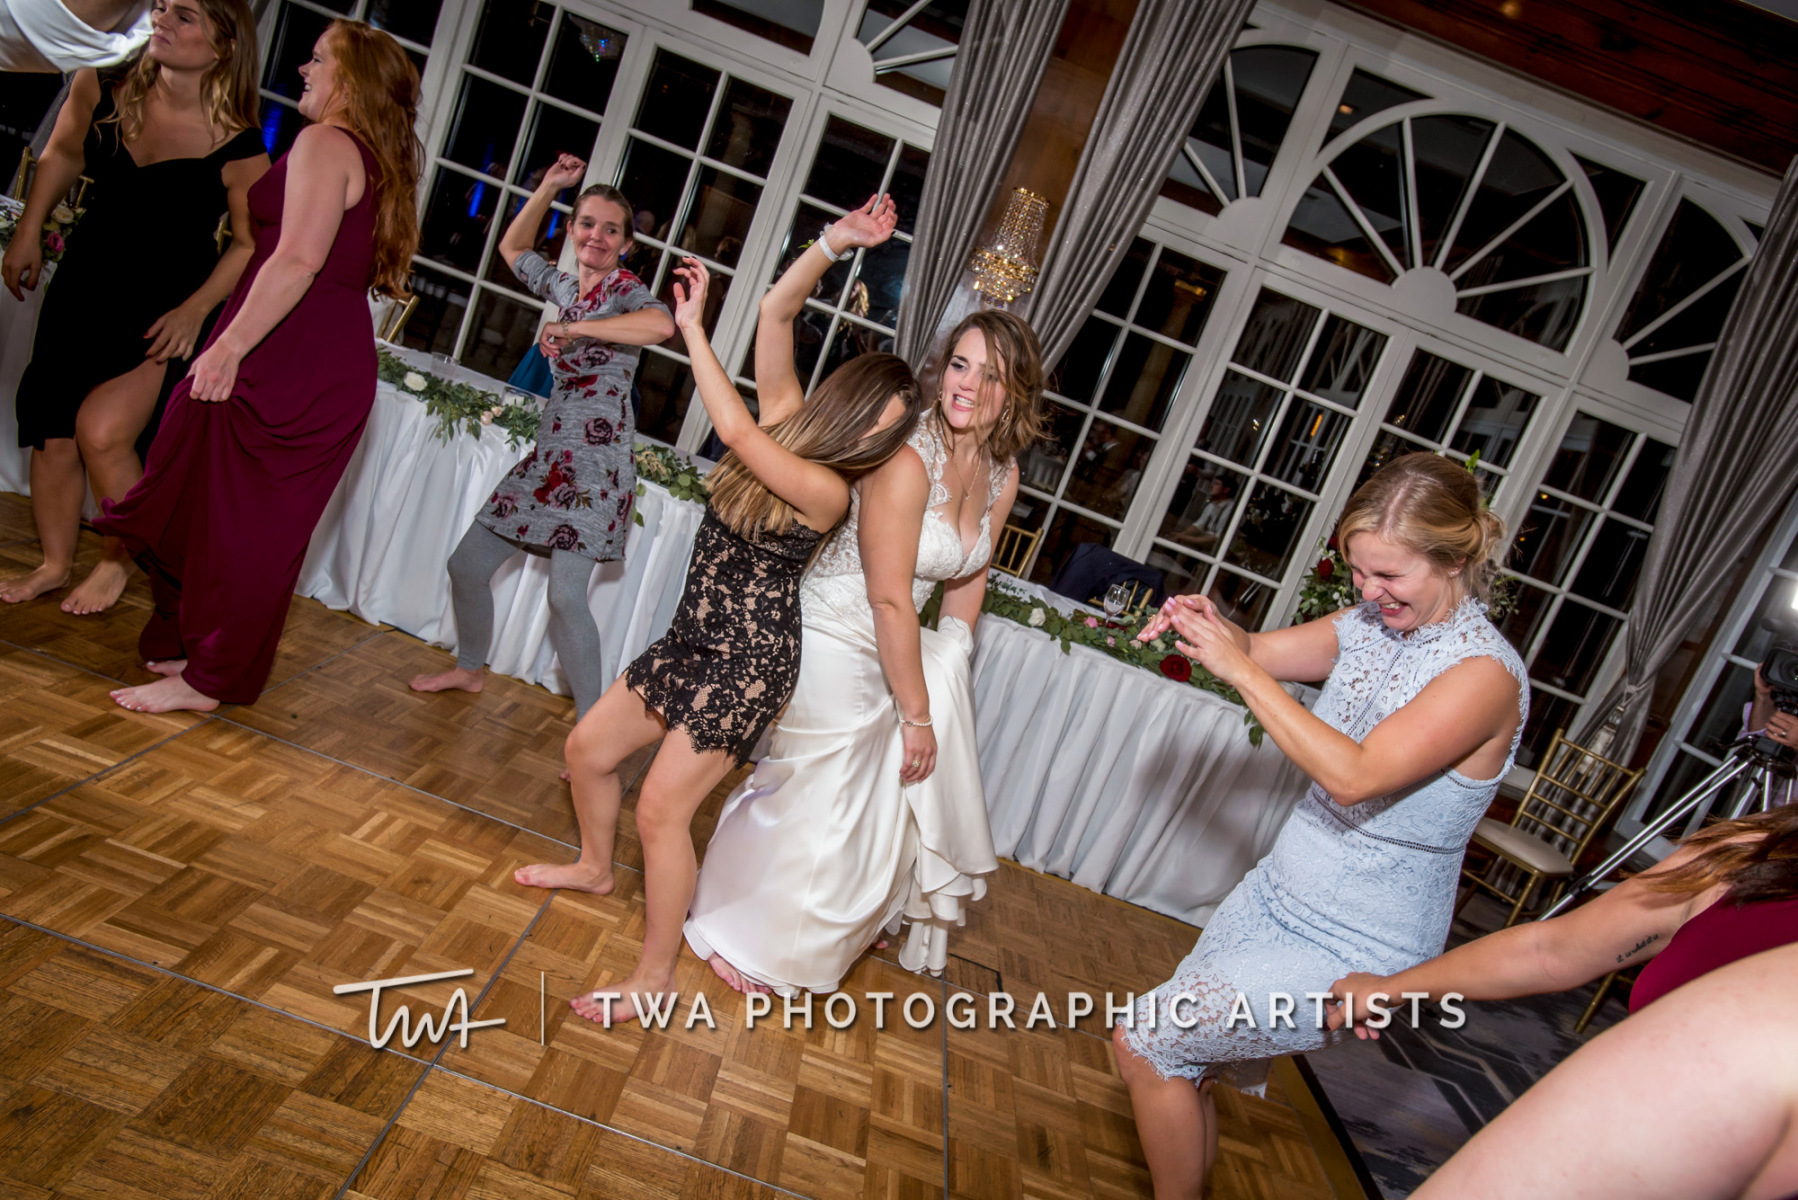 Chicago-Wedding-Photographer-TWA-Photographic-Artists-Drake-Hotal-Oak-Brook_McCann_Pendleton-0873